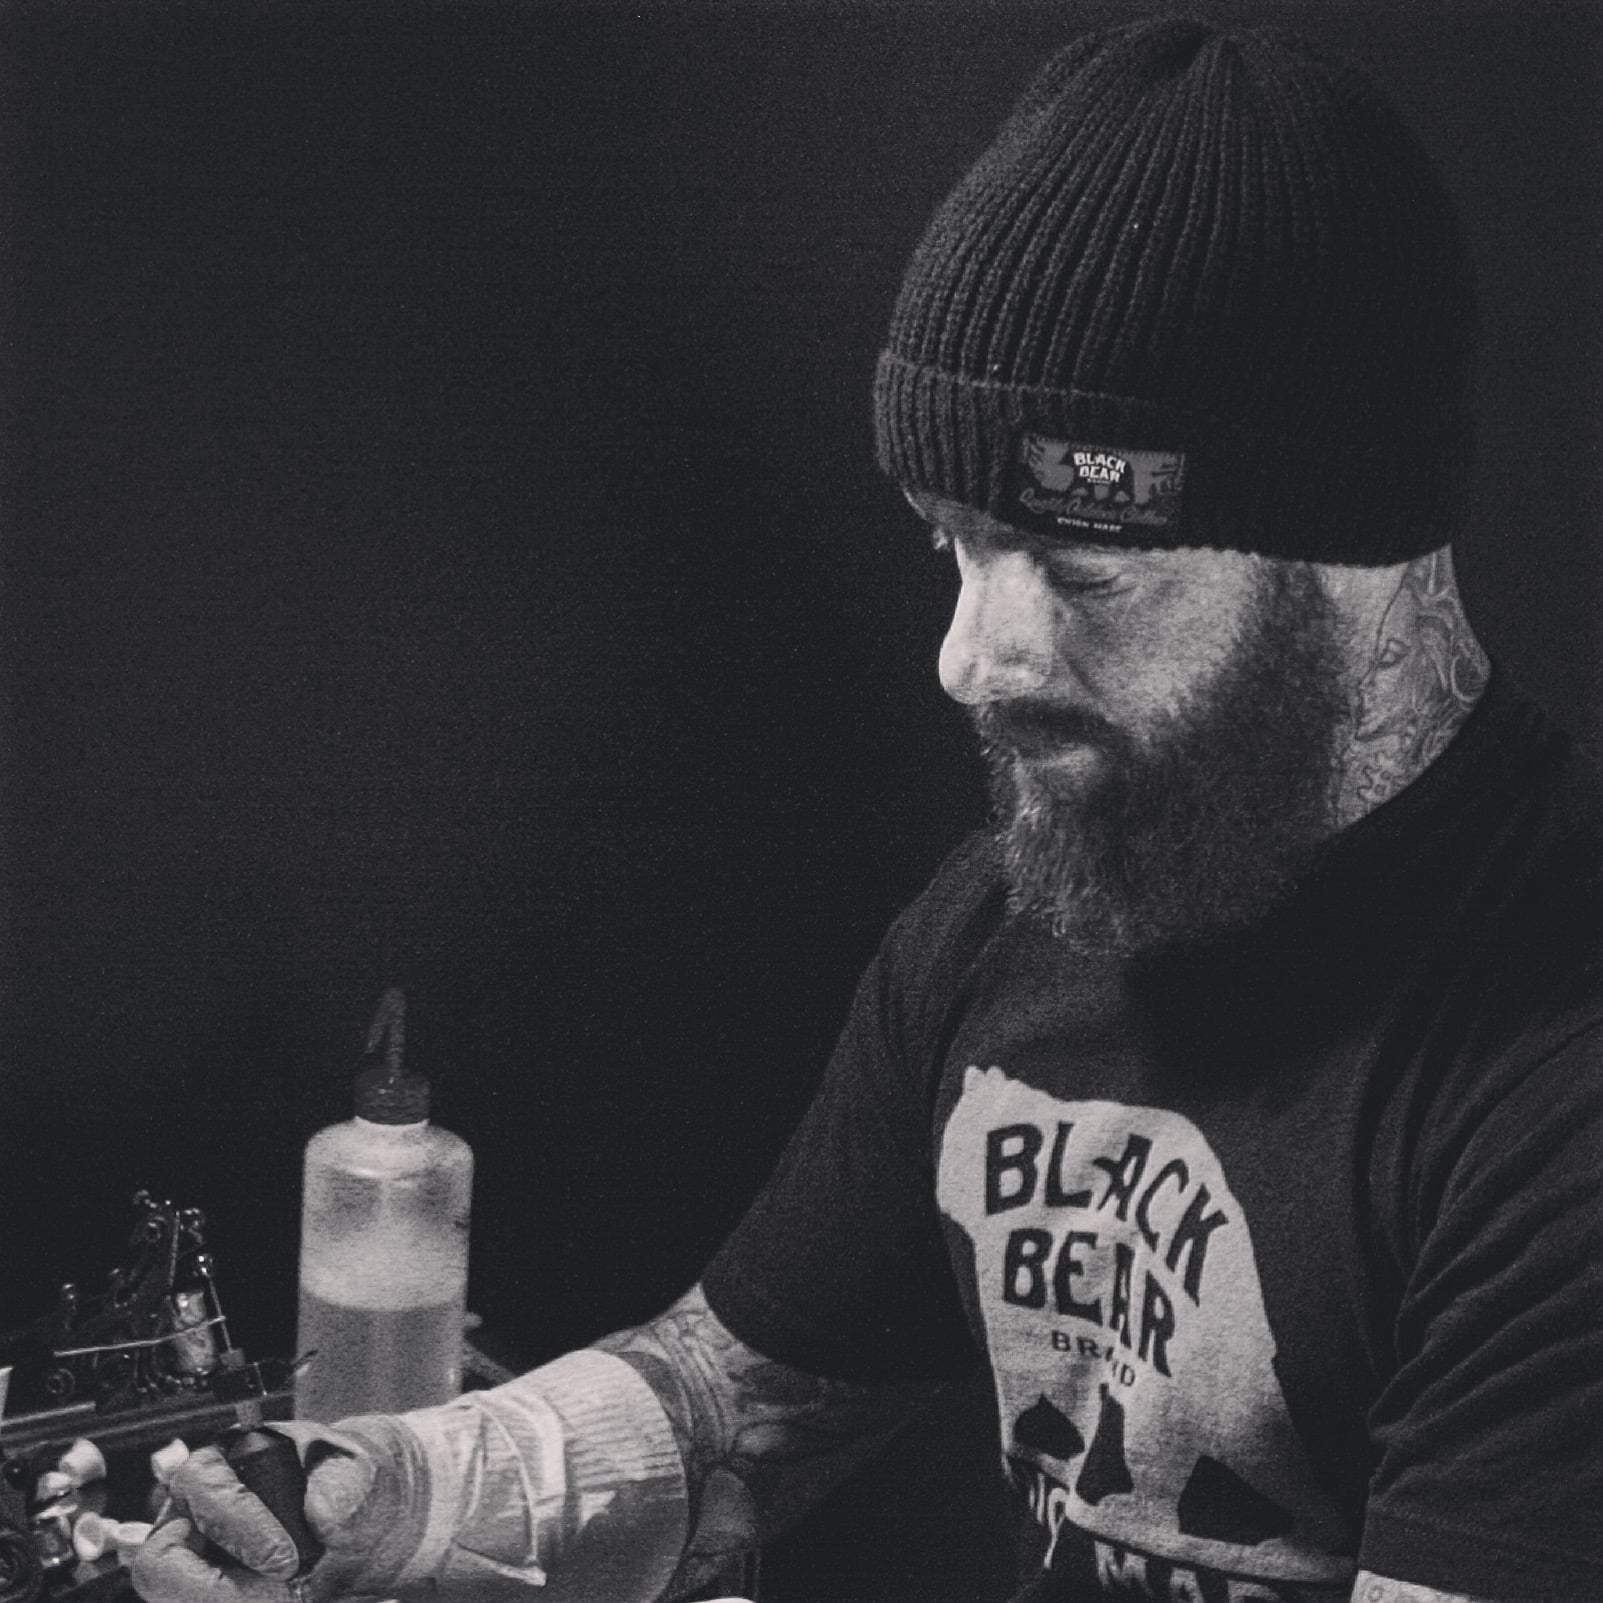 Black-Bear-Brand-Union-of-Makers-Craft-01.JPG